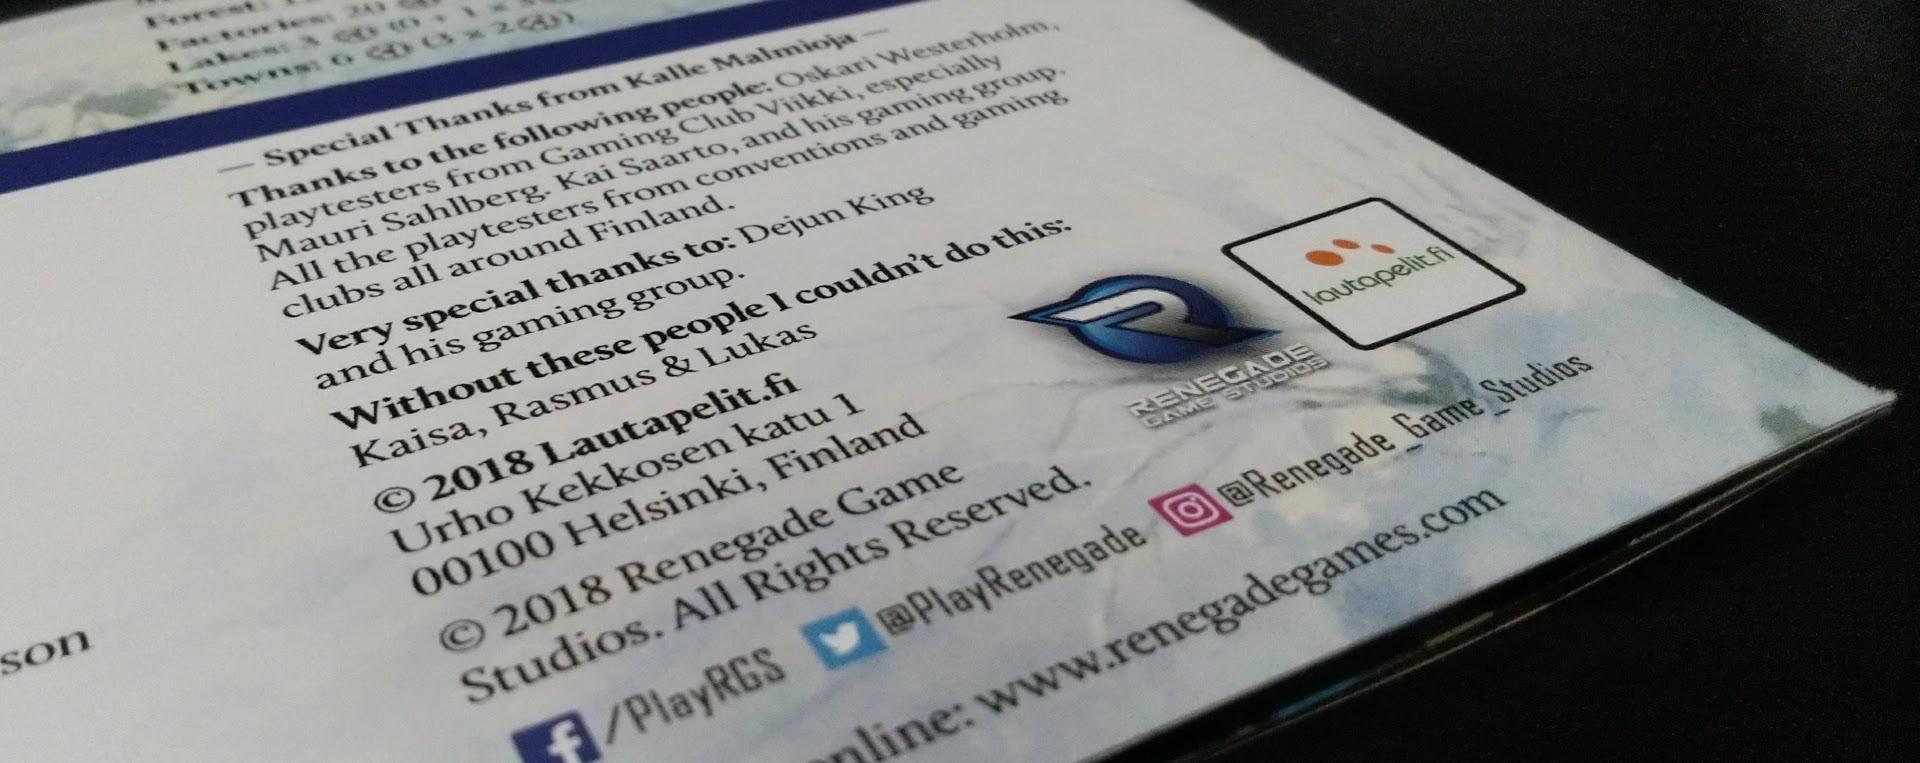 playtester credits.jpg